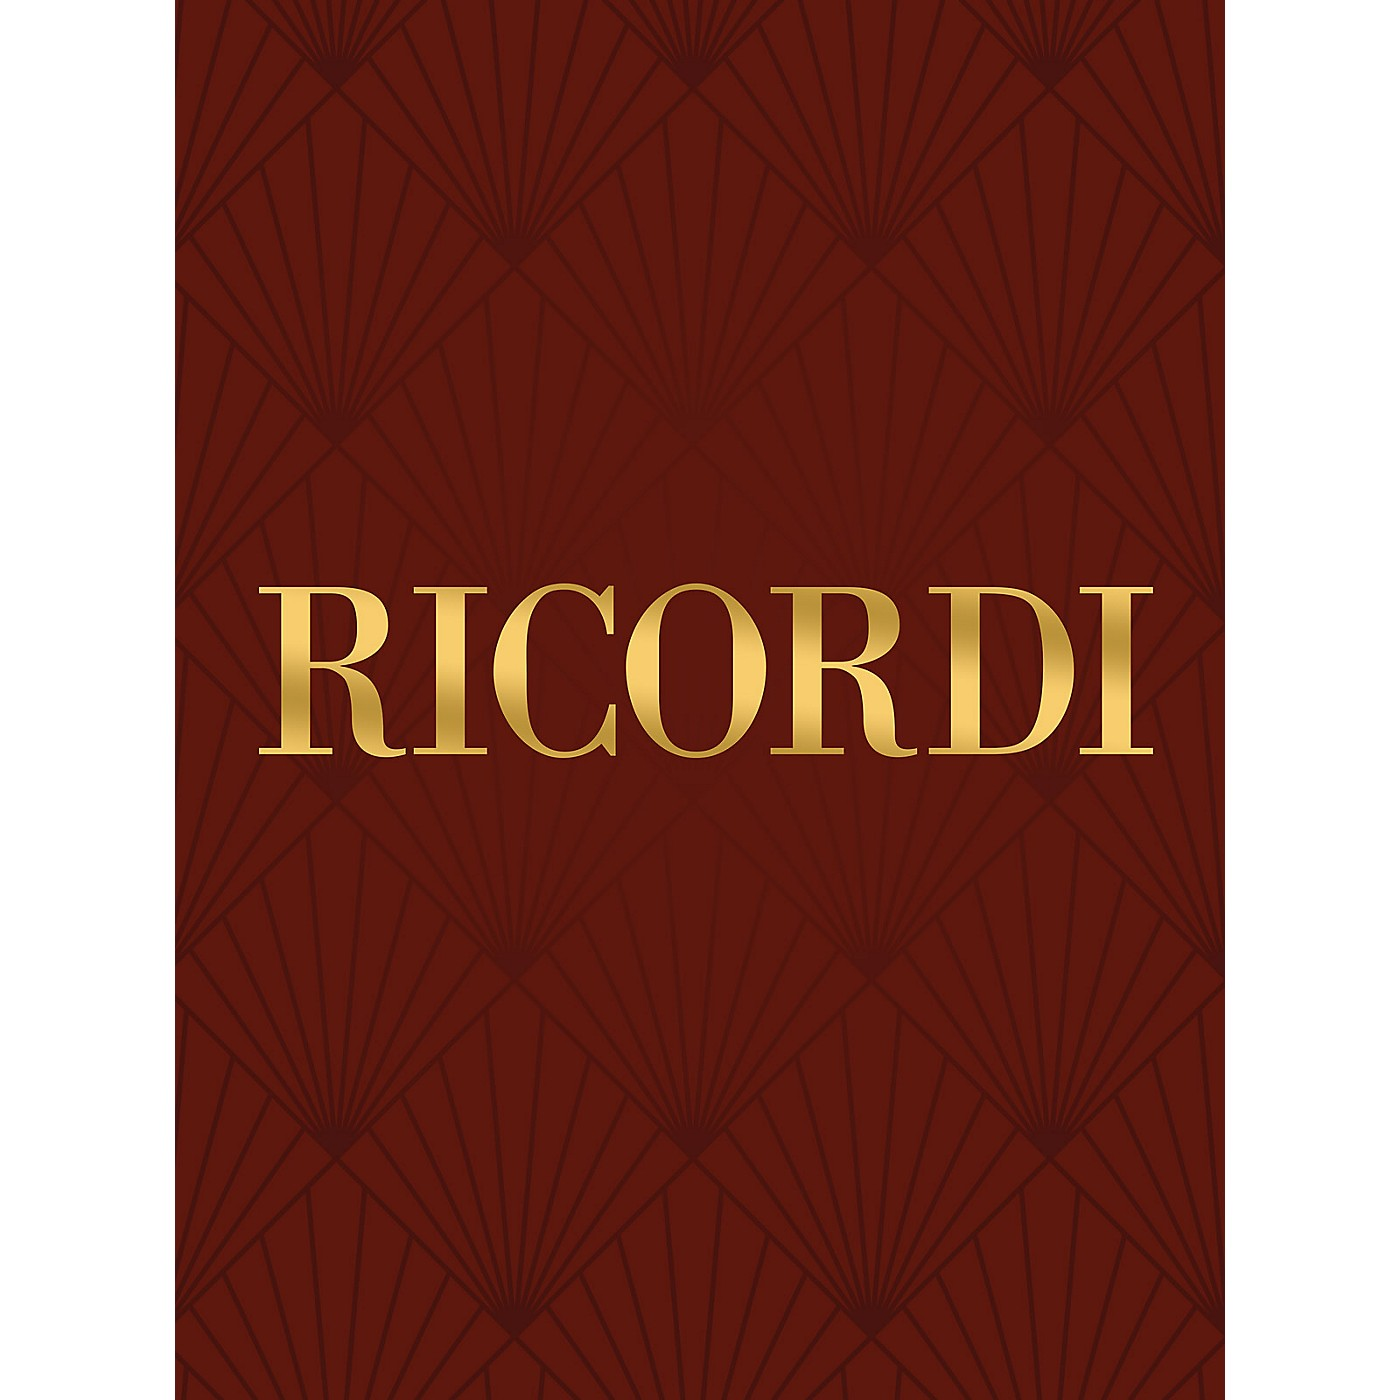 Ricordi In furore justissimae irae RV626 Vocal Series Composed by Antonio Vivaldi Edited by Paul Everett thumbnail